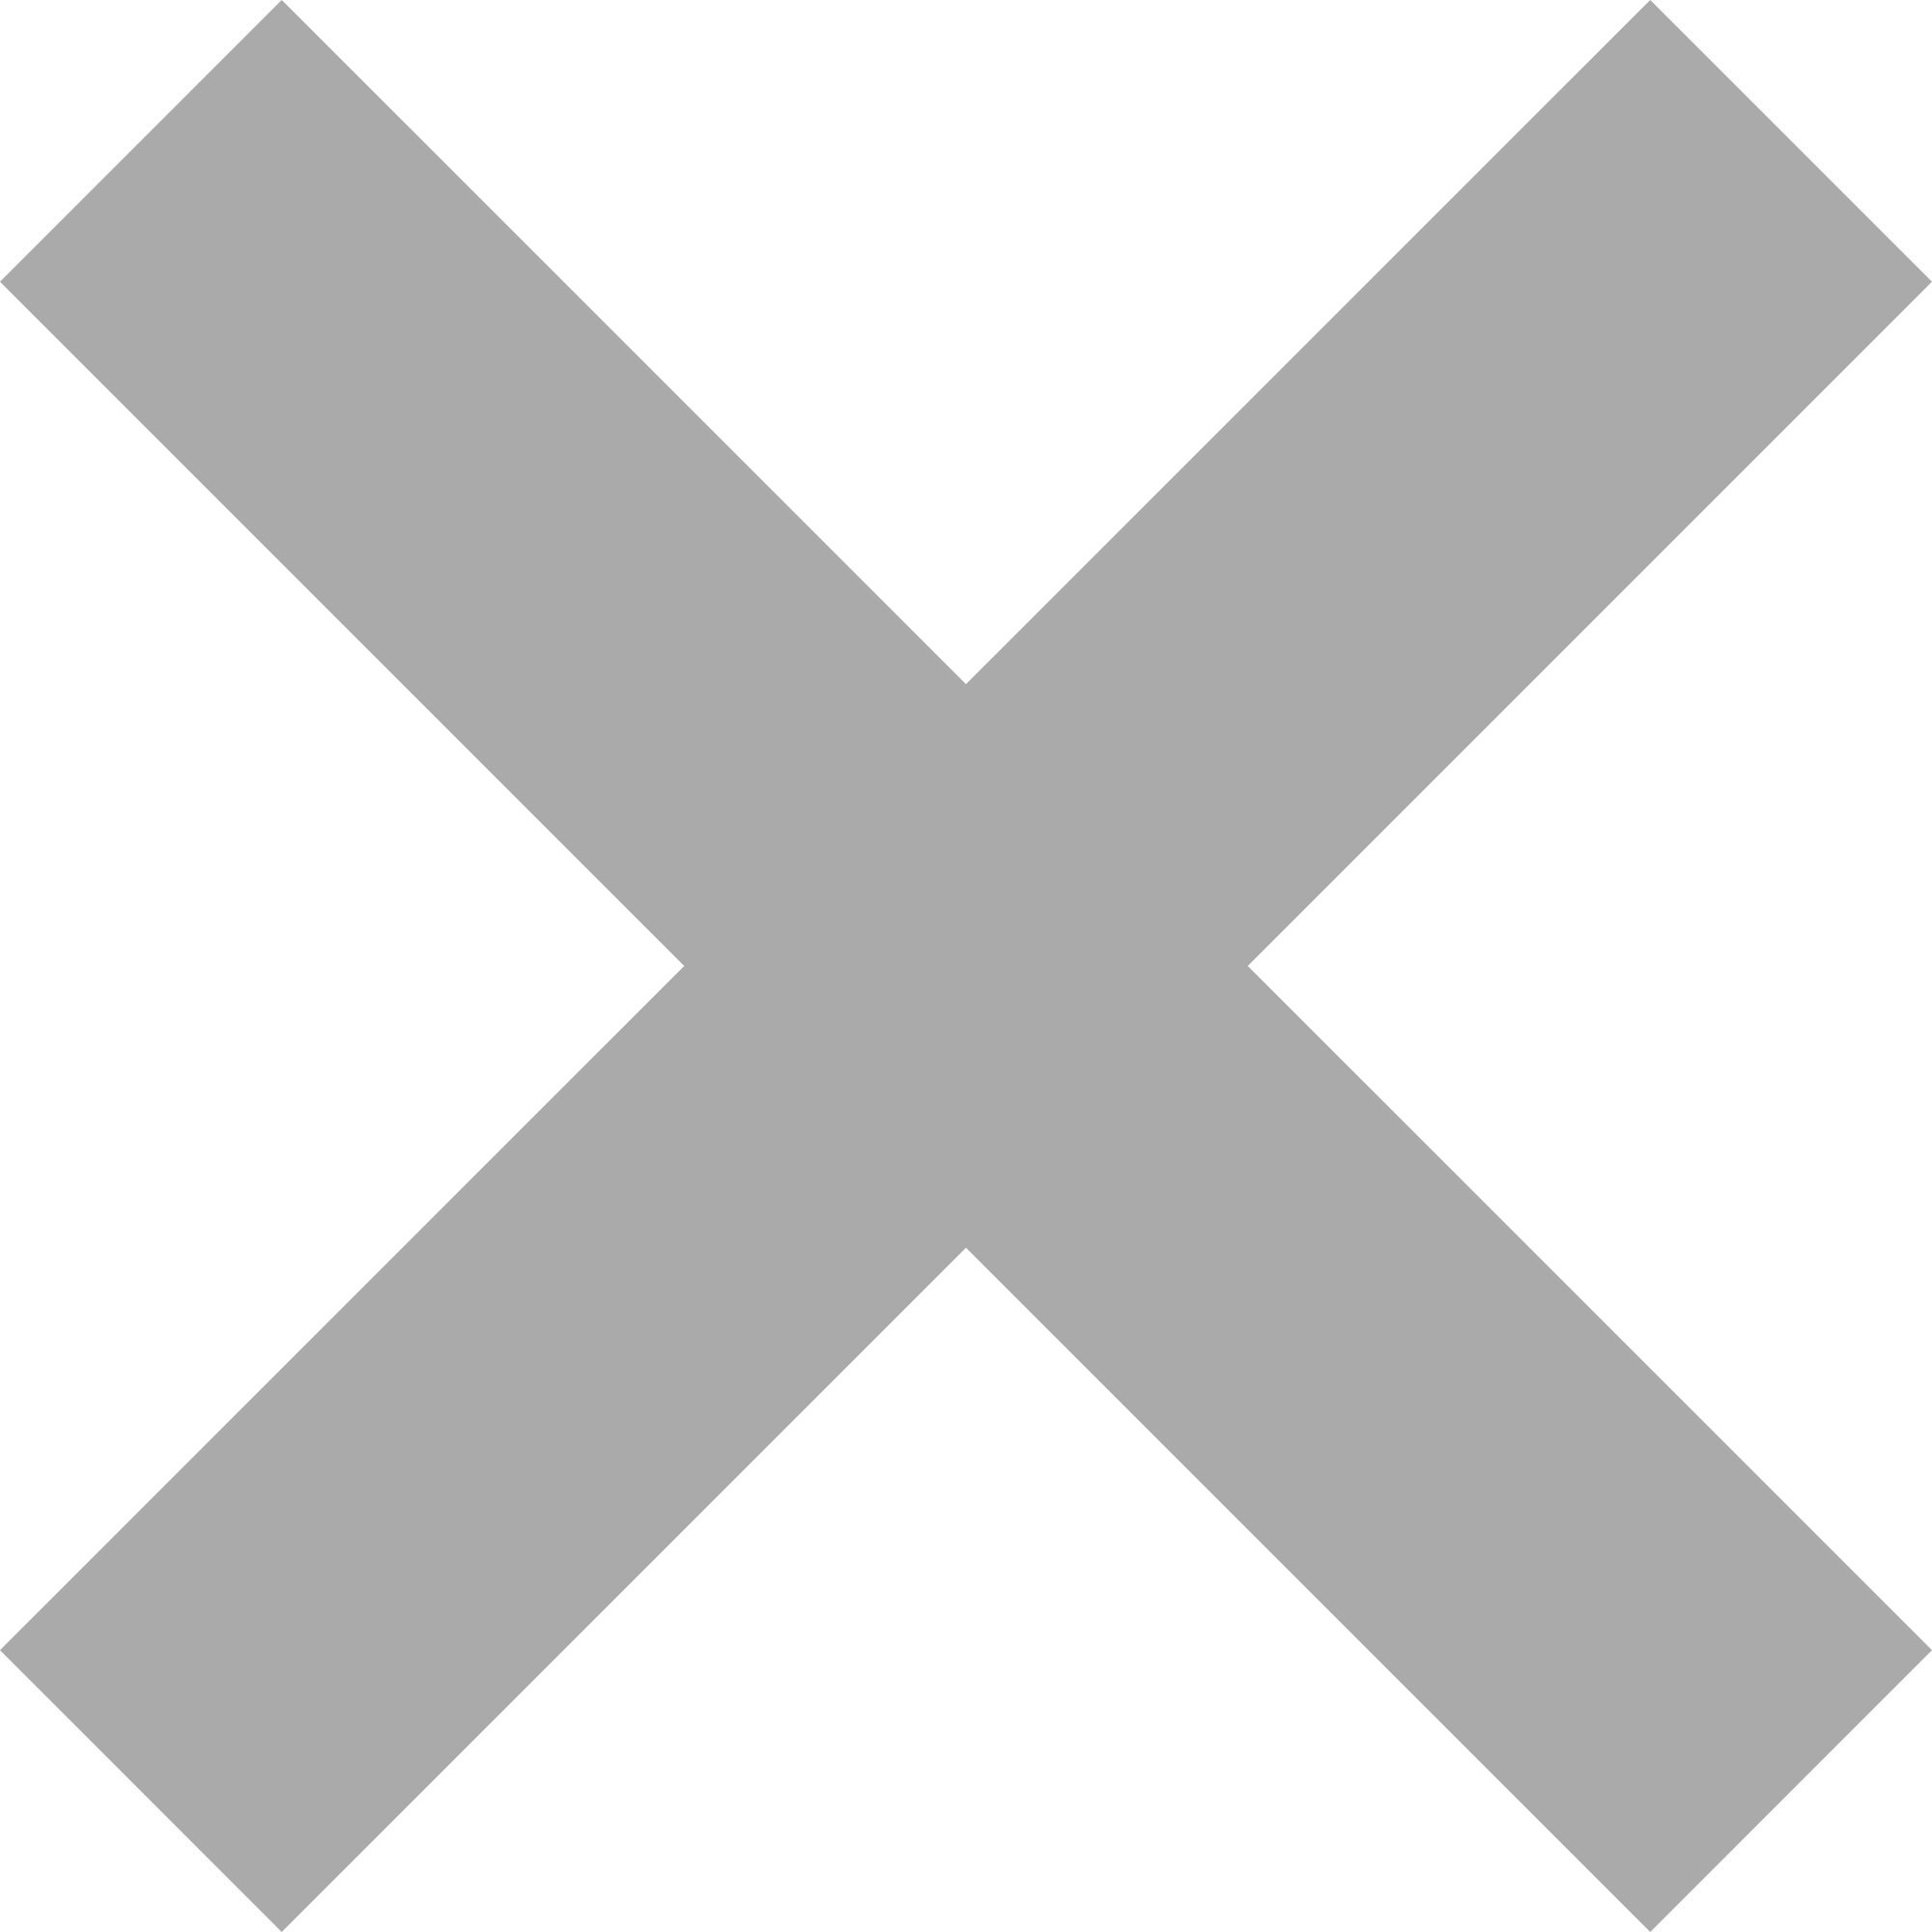 Letter X - Dr. Odd